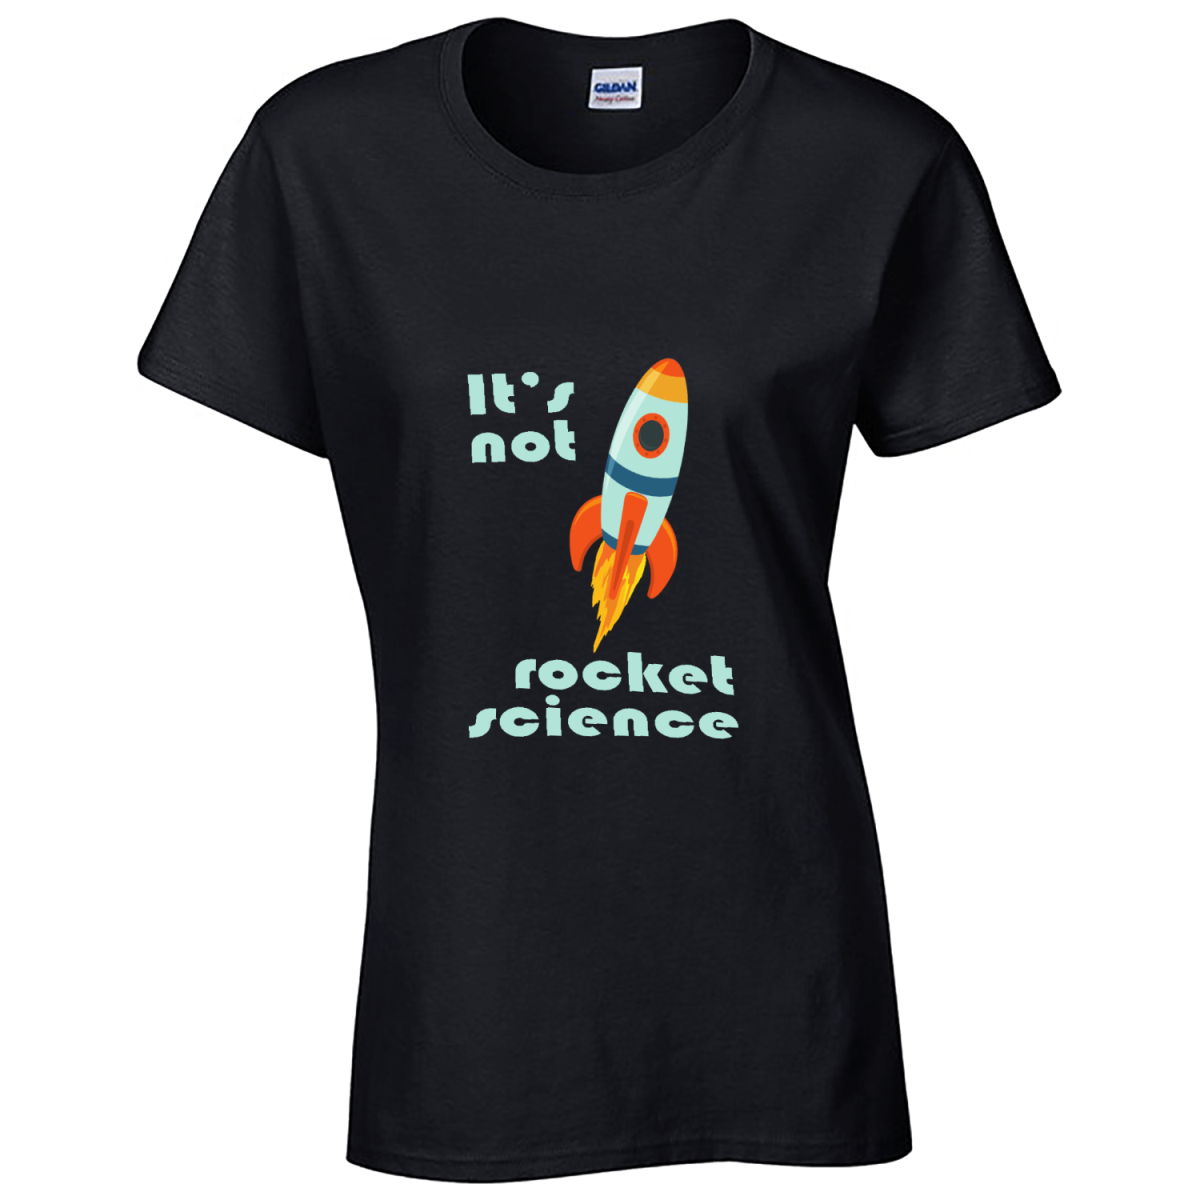 Custom Printed T-Shirt - Black - Rocket